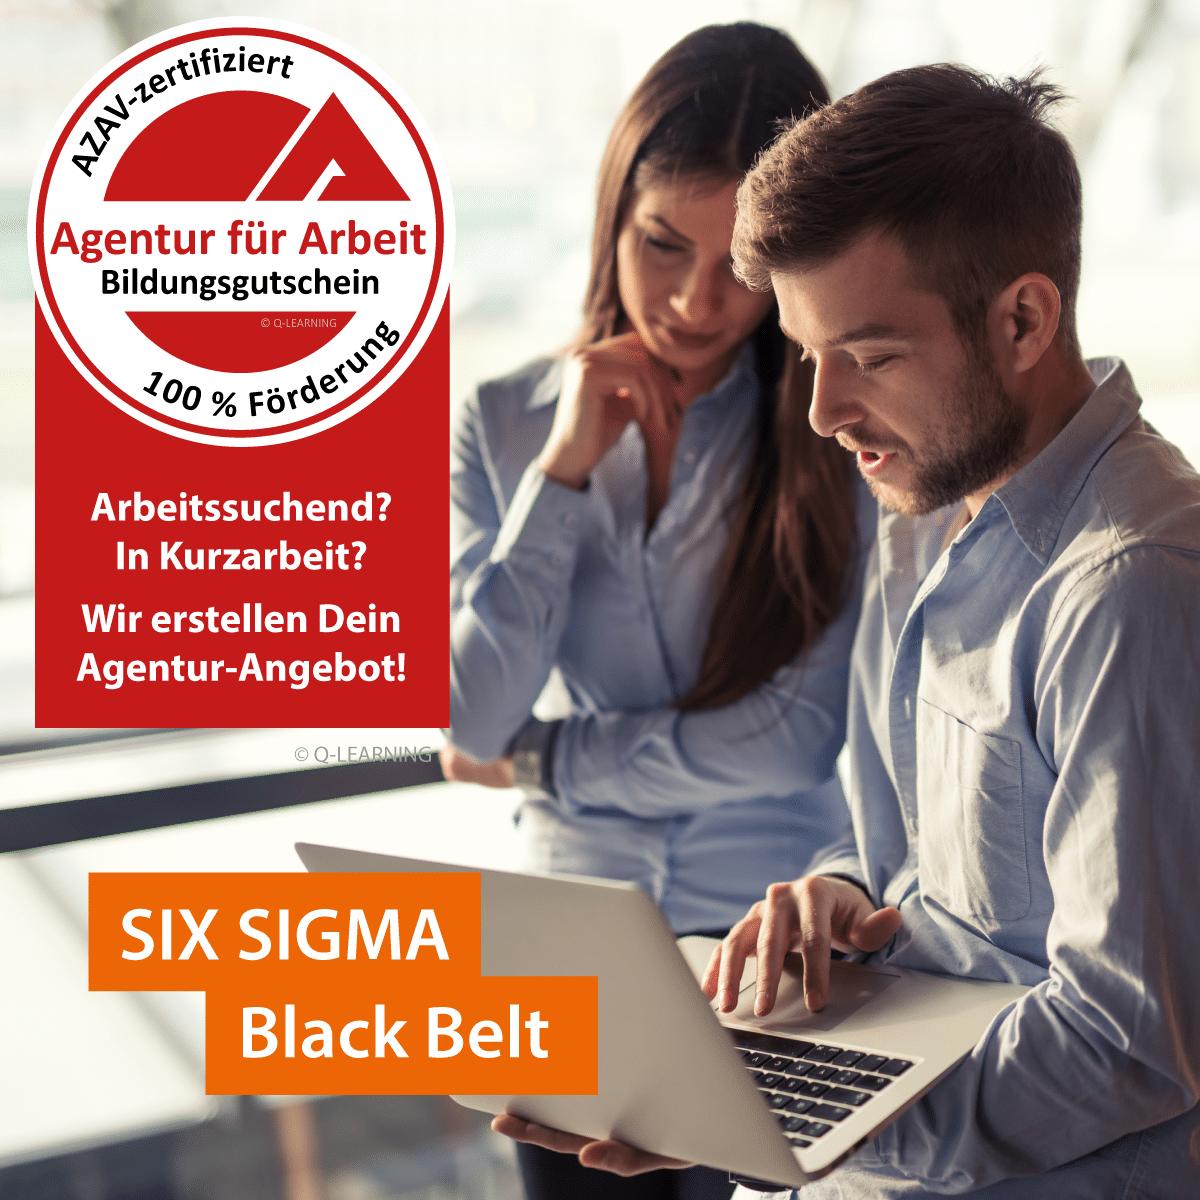 SIX SIGMA Black Belt AZAV 410040